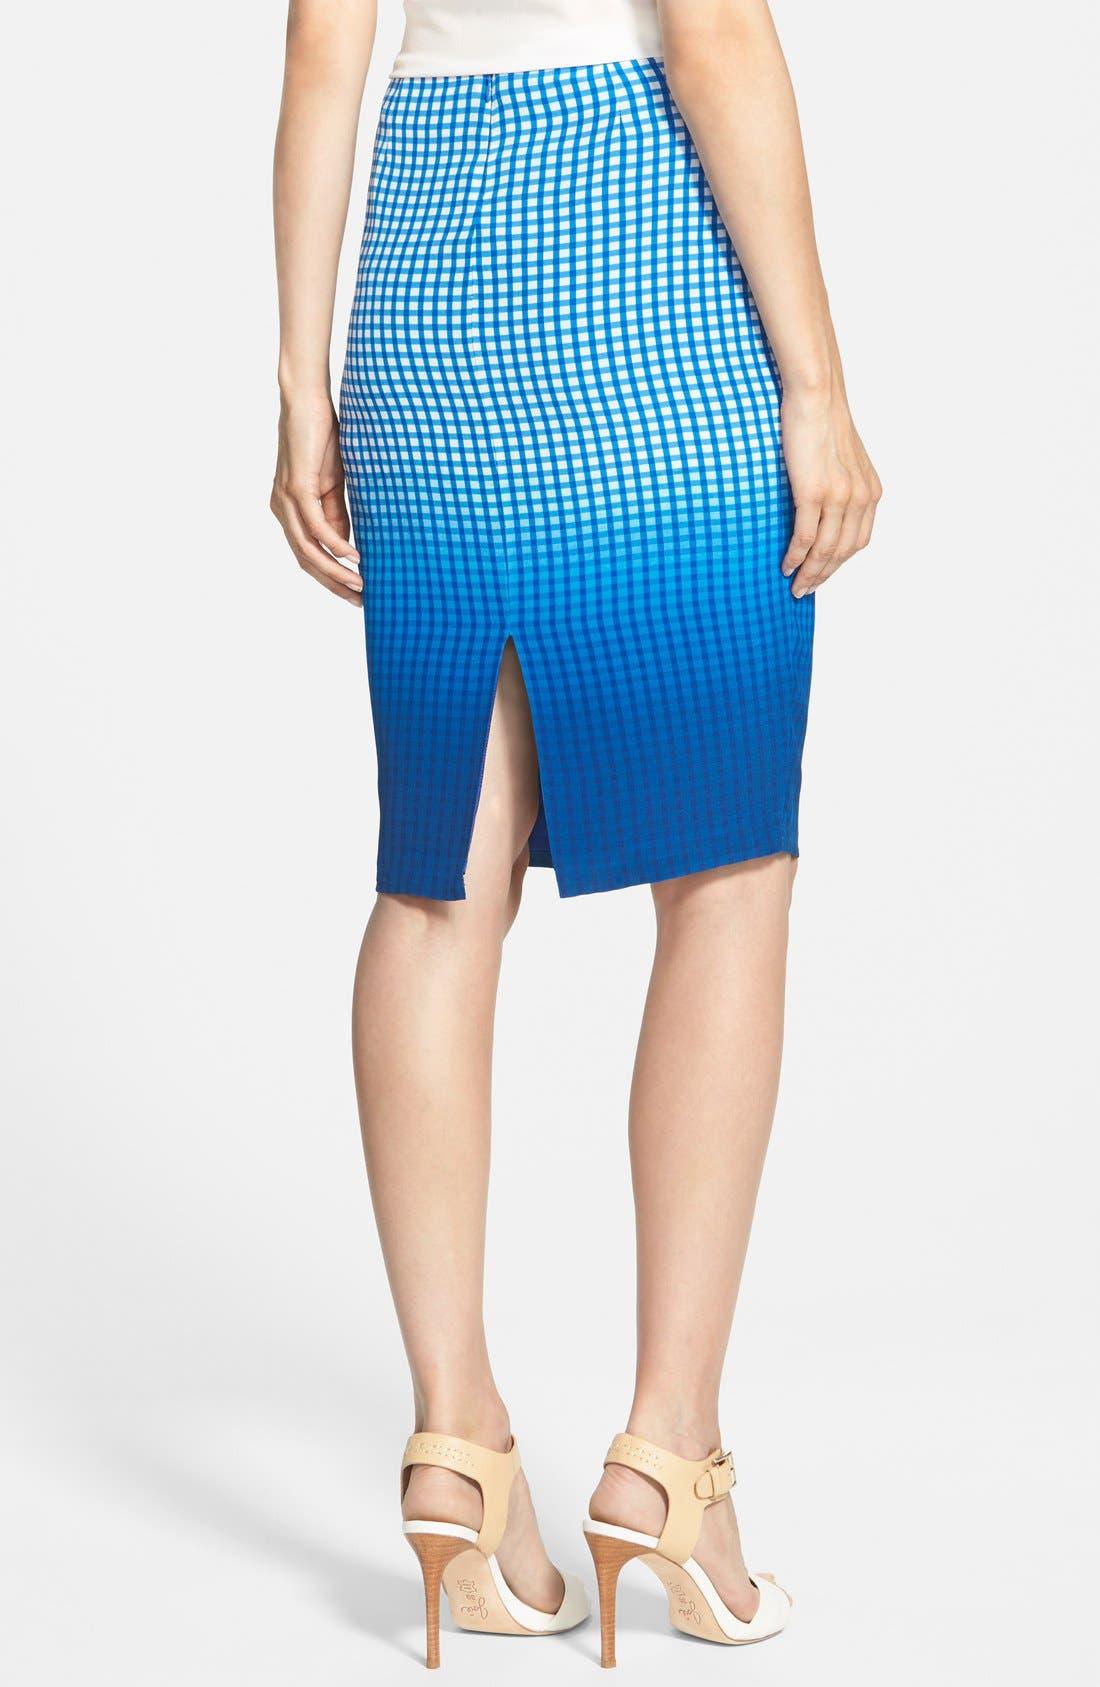 Alternate Image 2  - Bailey 44 'Astley' Dip Dye Check Silk Pencil Skirt